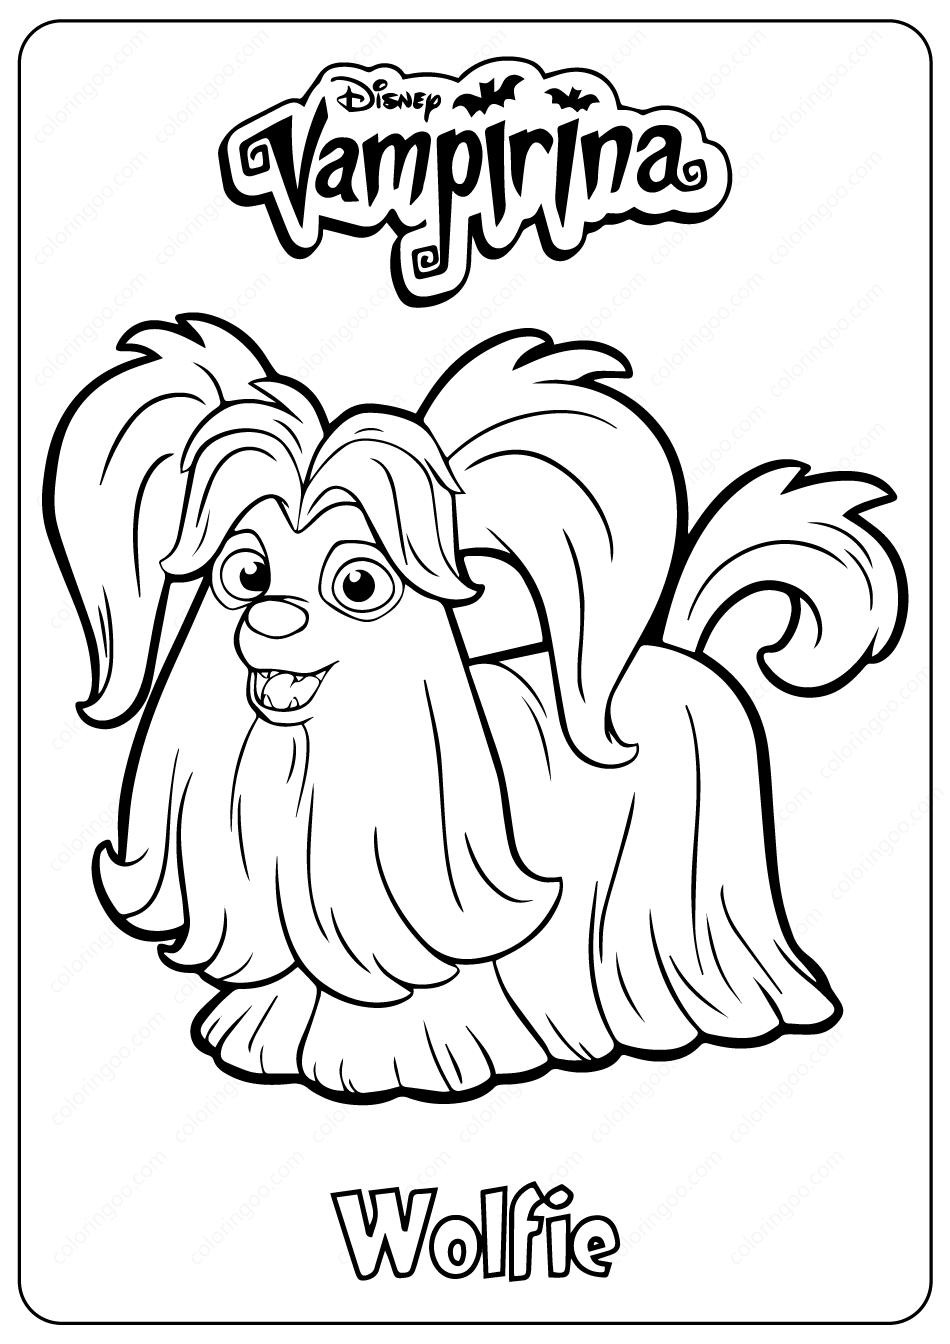 Printable Disney Vampirina Wolfie Coloring Pages